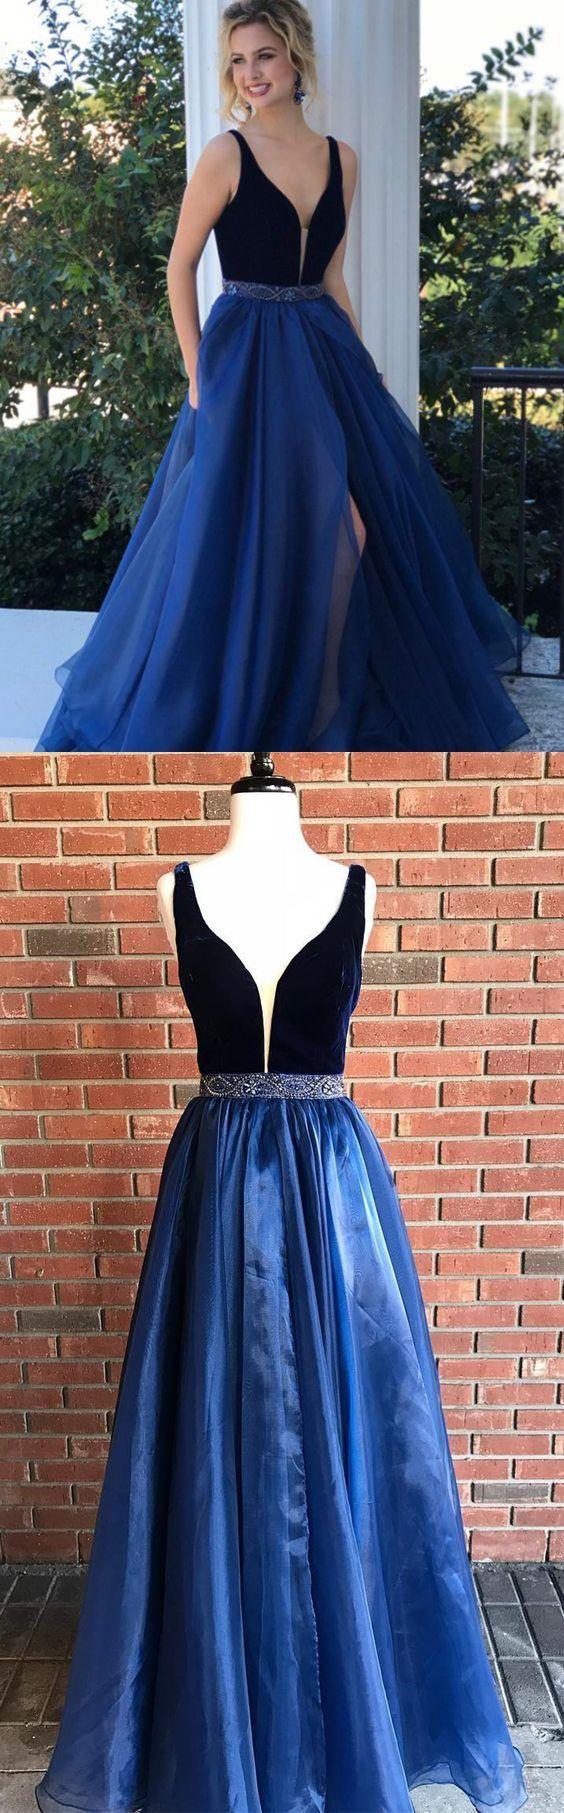 long prom dress aline simple modest beautiful cheap prom dress